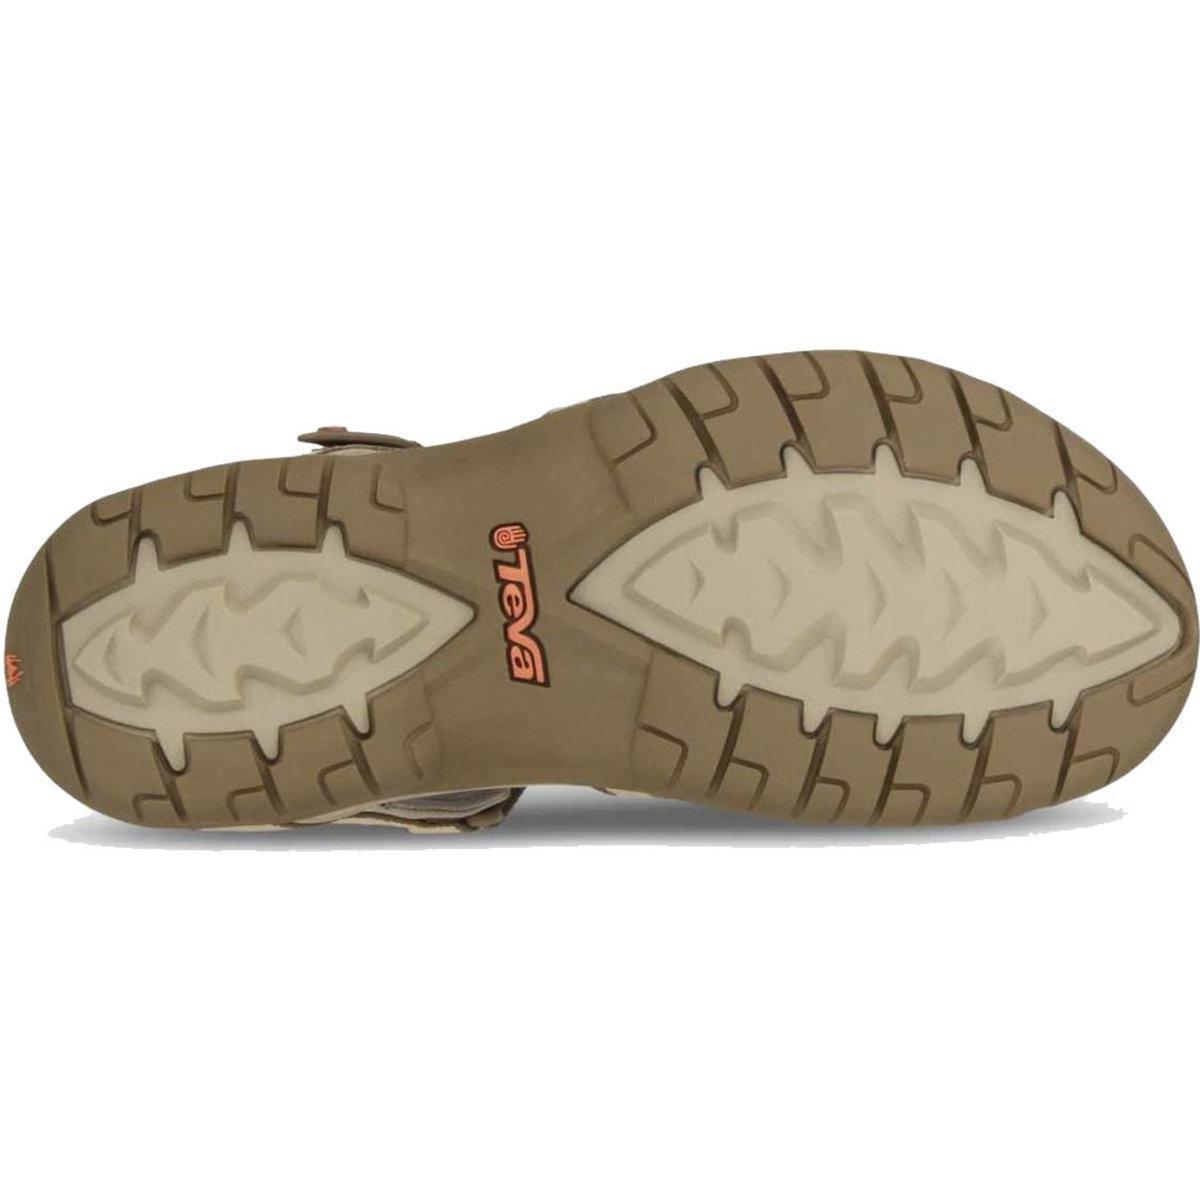 c5eaf06d109615 Teva - Multicolor Tirra Water Sandal - Lyst. View fullscreen